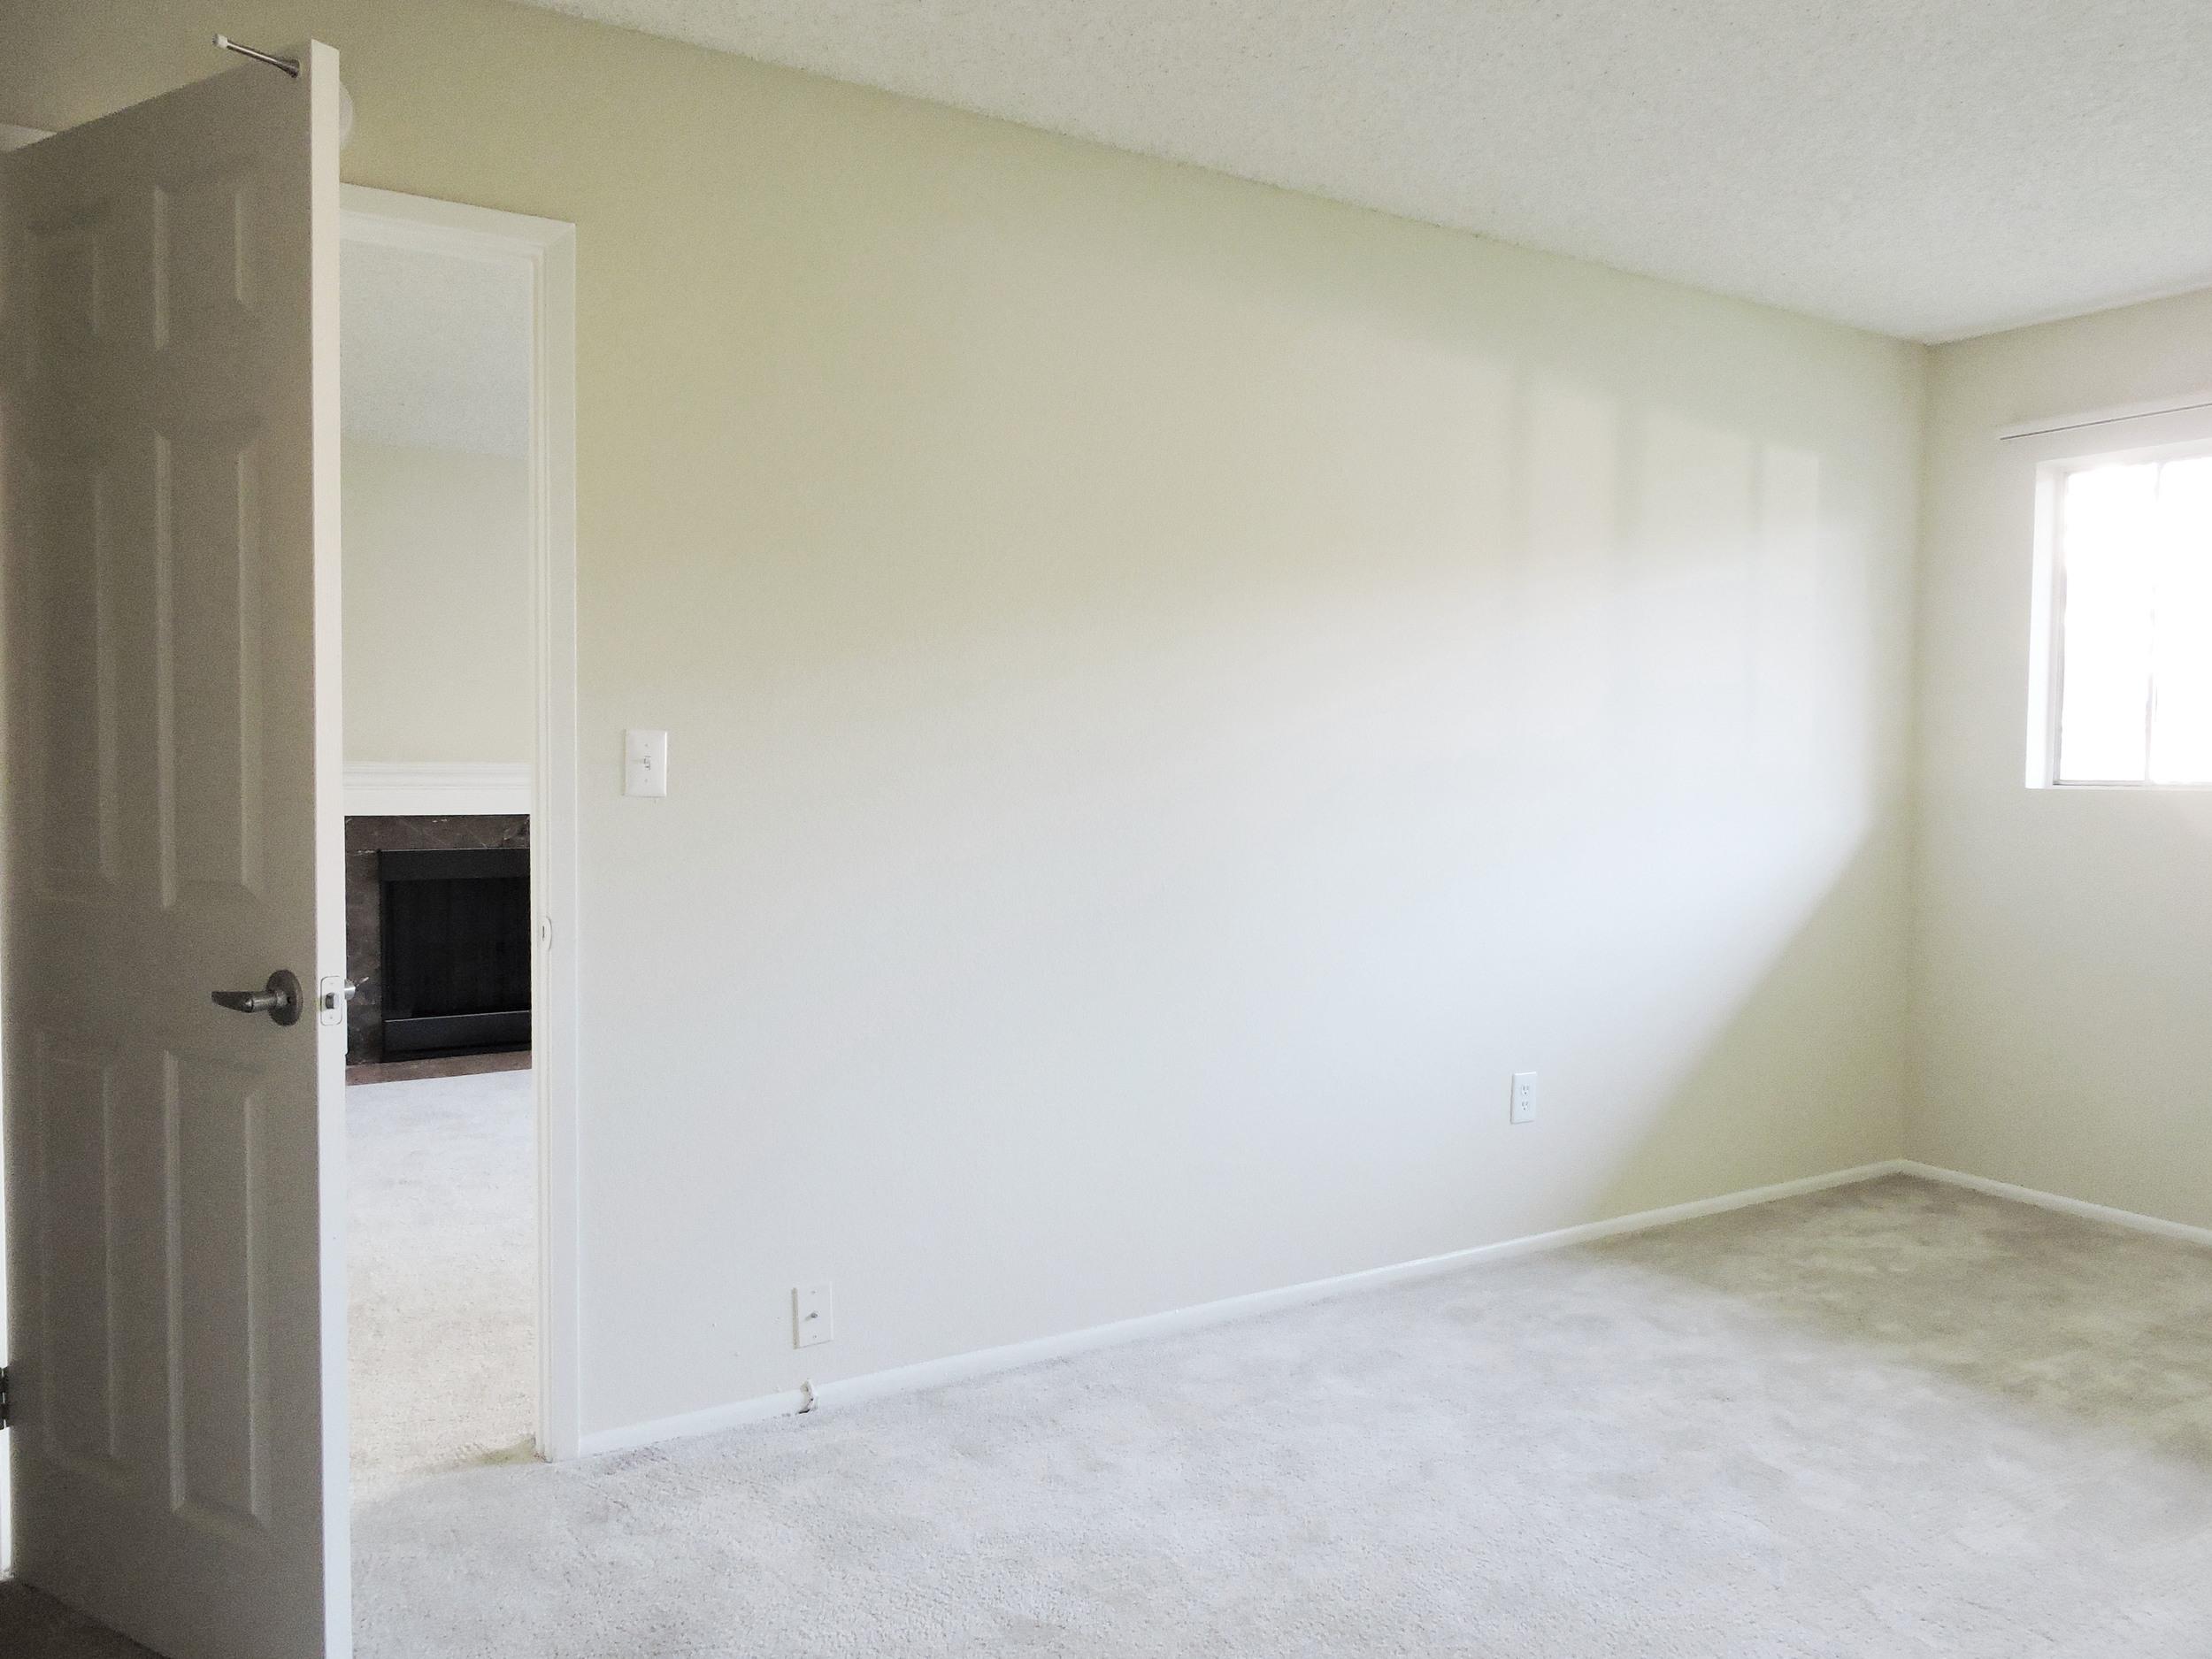 163 1 bedroom2.jpg